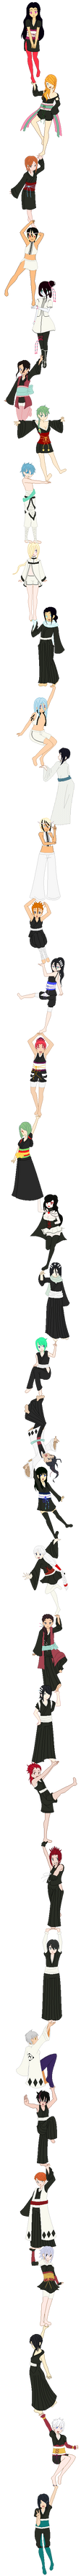 Next Generation of Death by kuloi-no-chloe